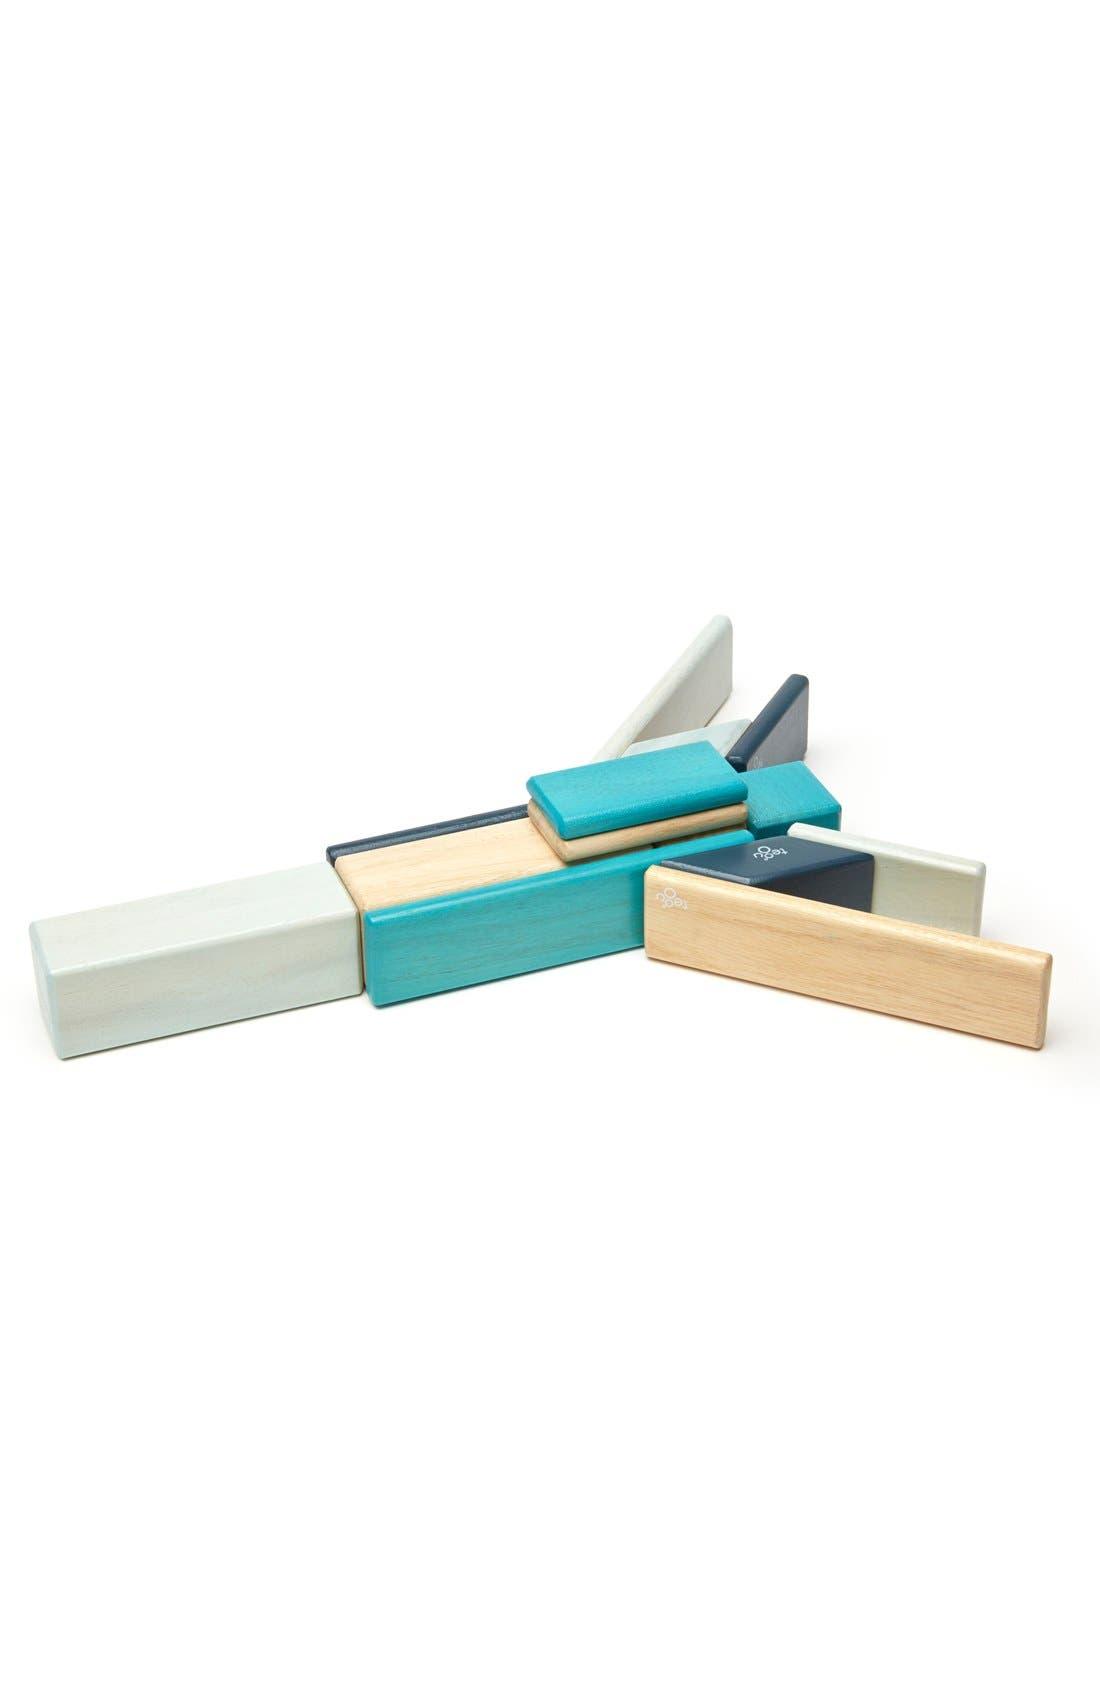 'Classics - Blues' Magnetic Wooden Blocks Play Set,                             Main thumbnail 1, color,                             400